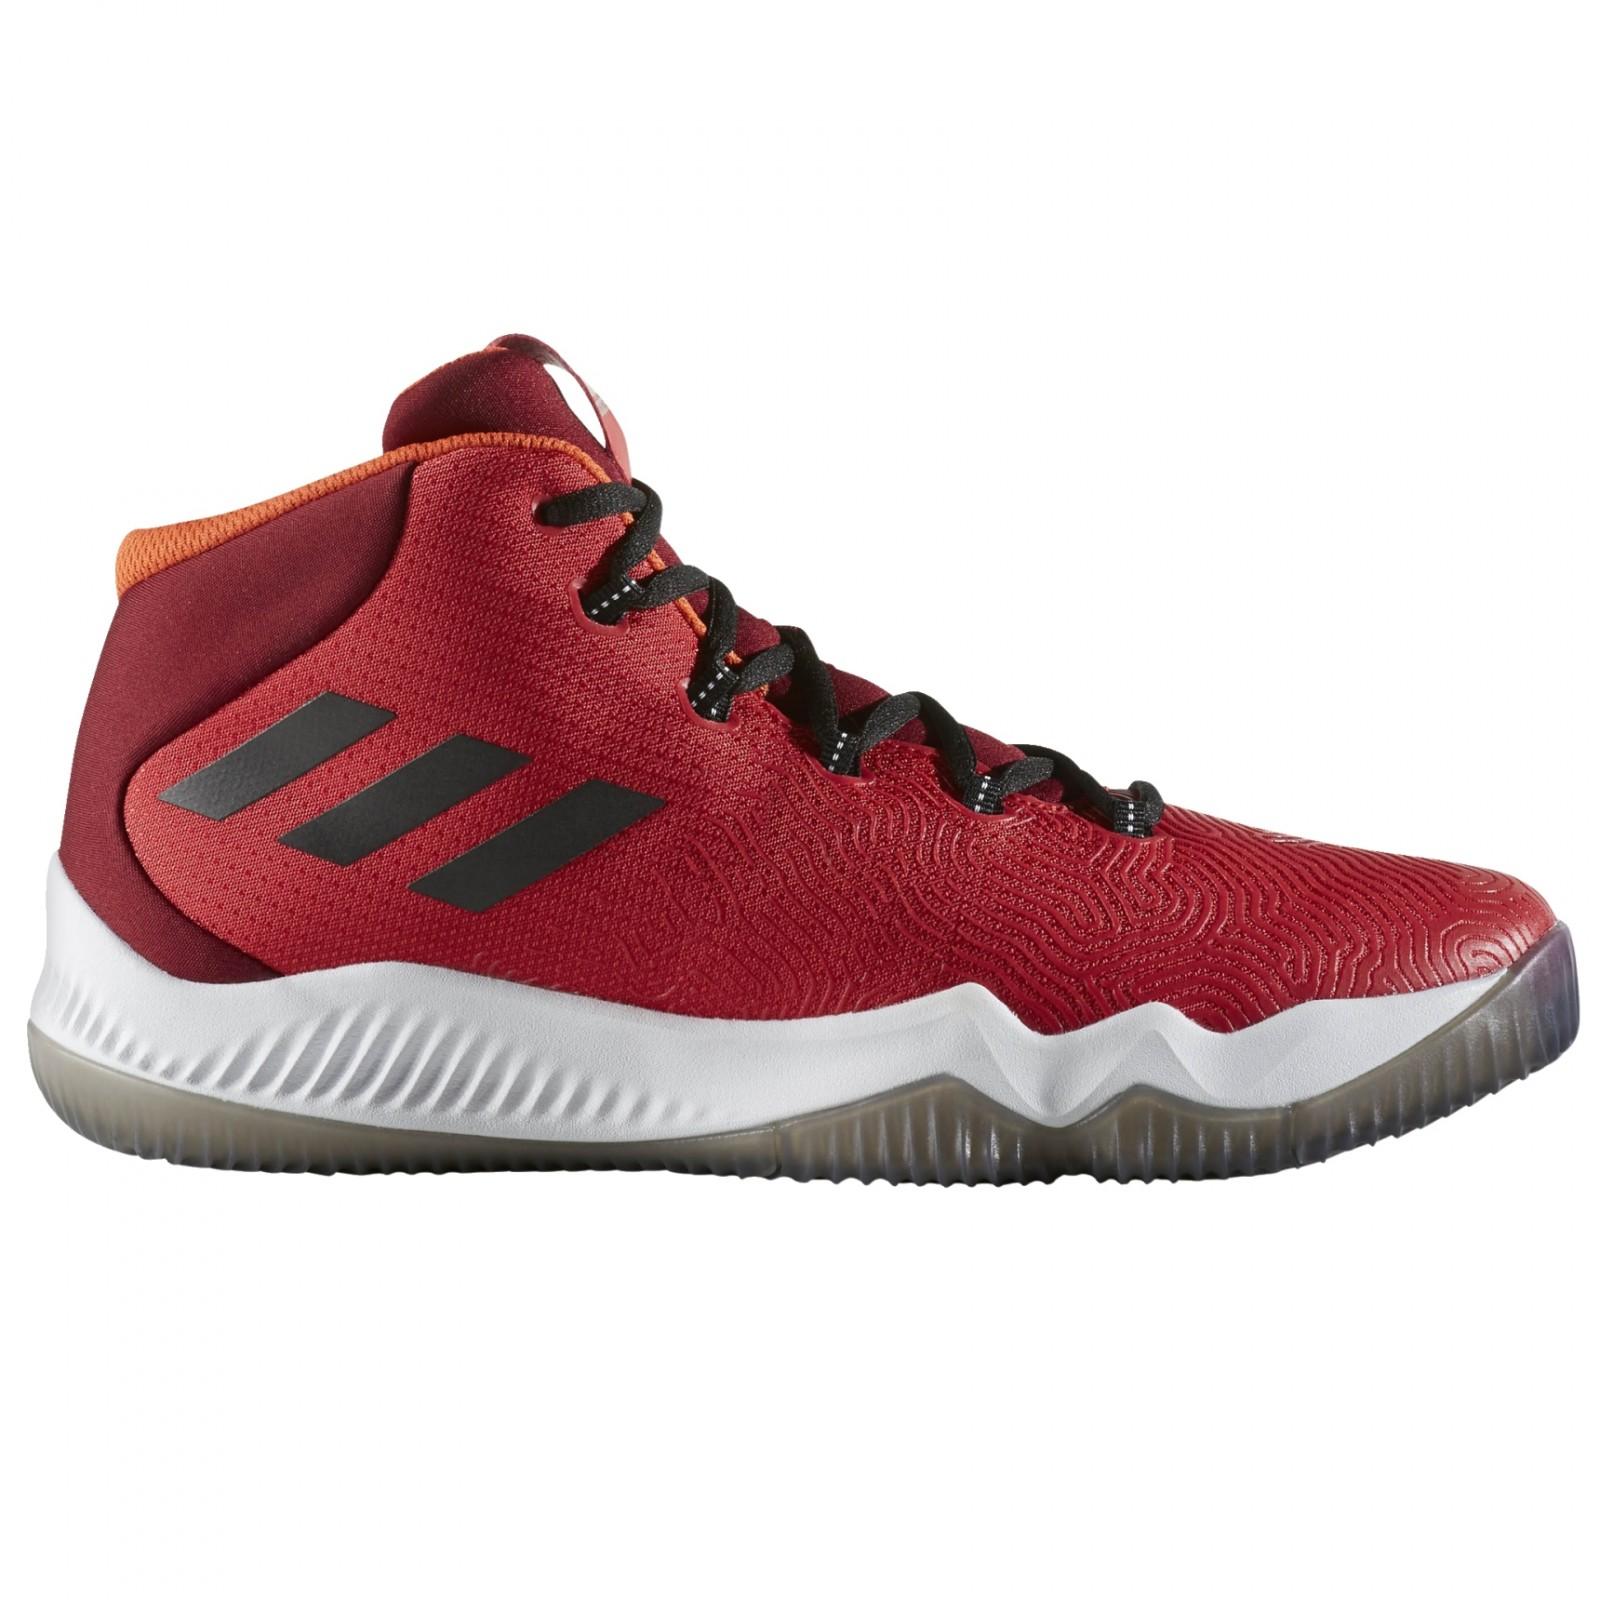 4816f73bfac Pánské basketbalové boty adidas Crazy Hustle